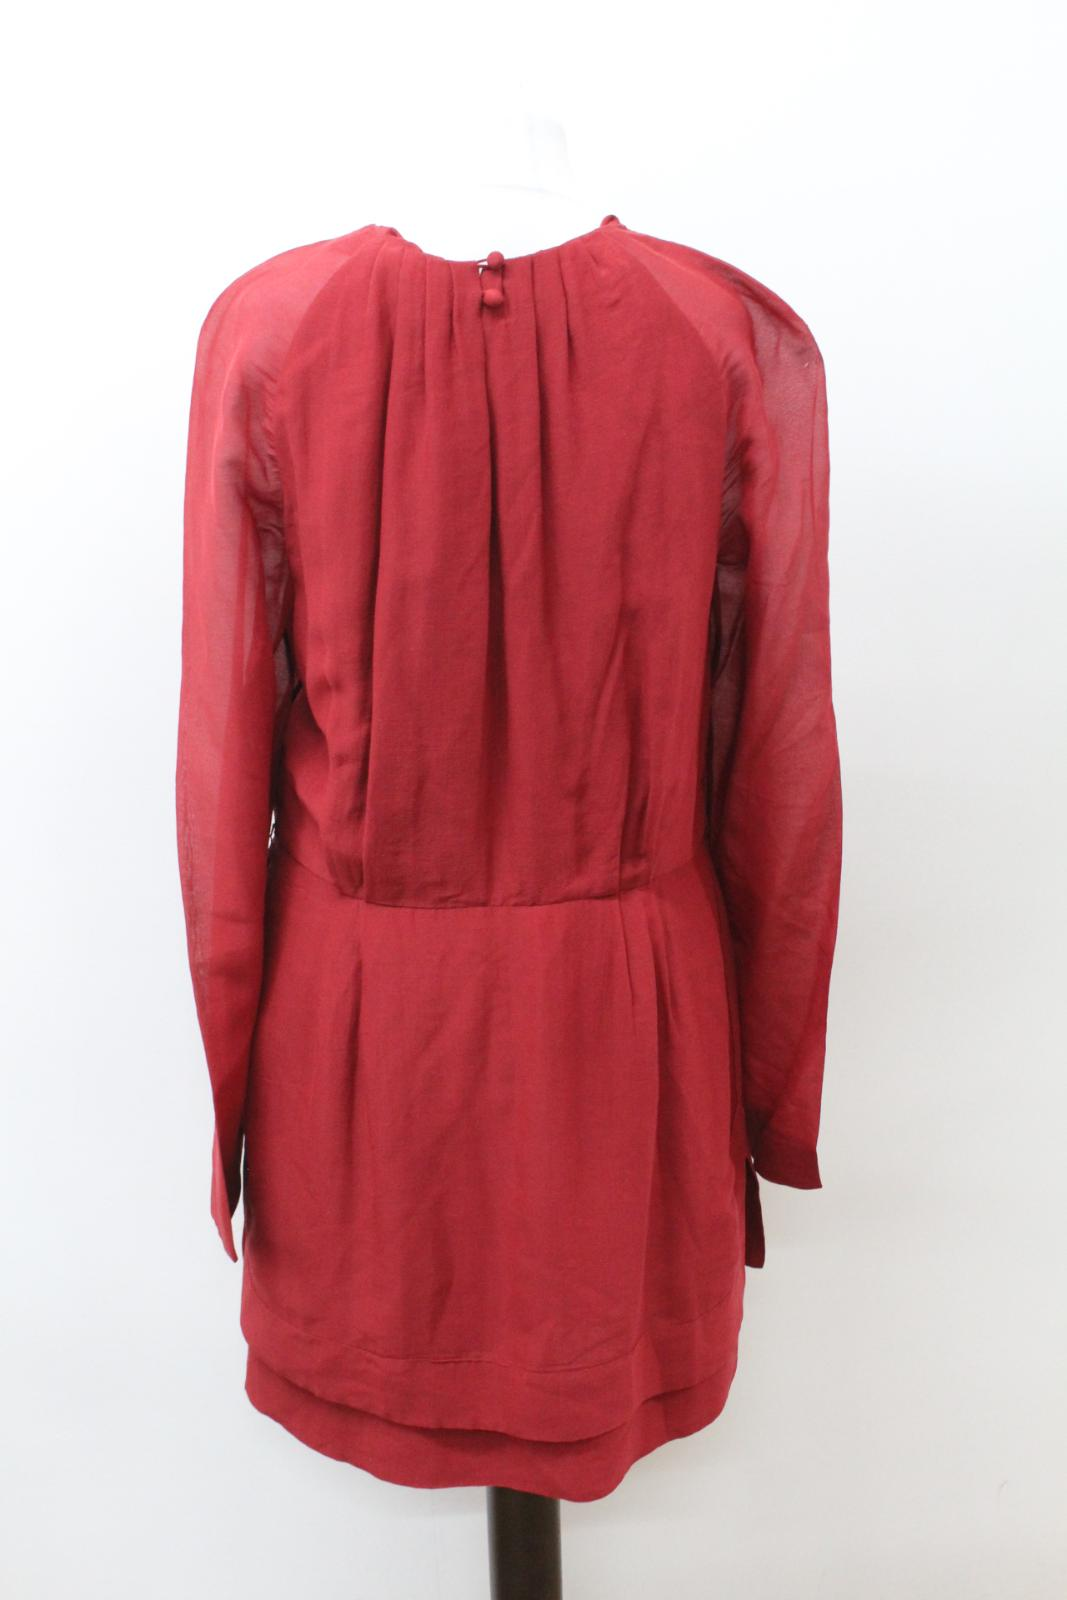 SARI GUERON Ladies Rusty Red Silk Silk Silk Long Sleeve Shift Style Dress US6 UK10 5c36d6